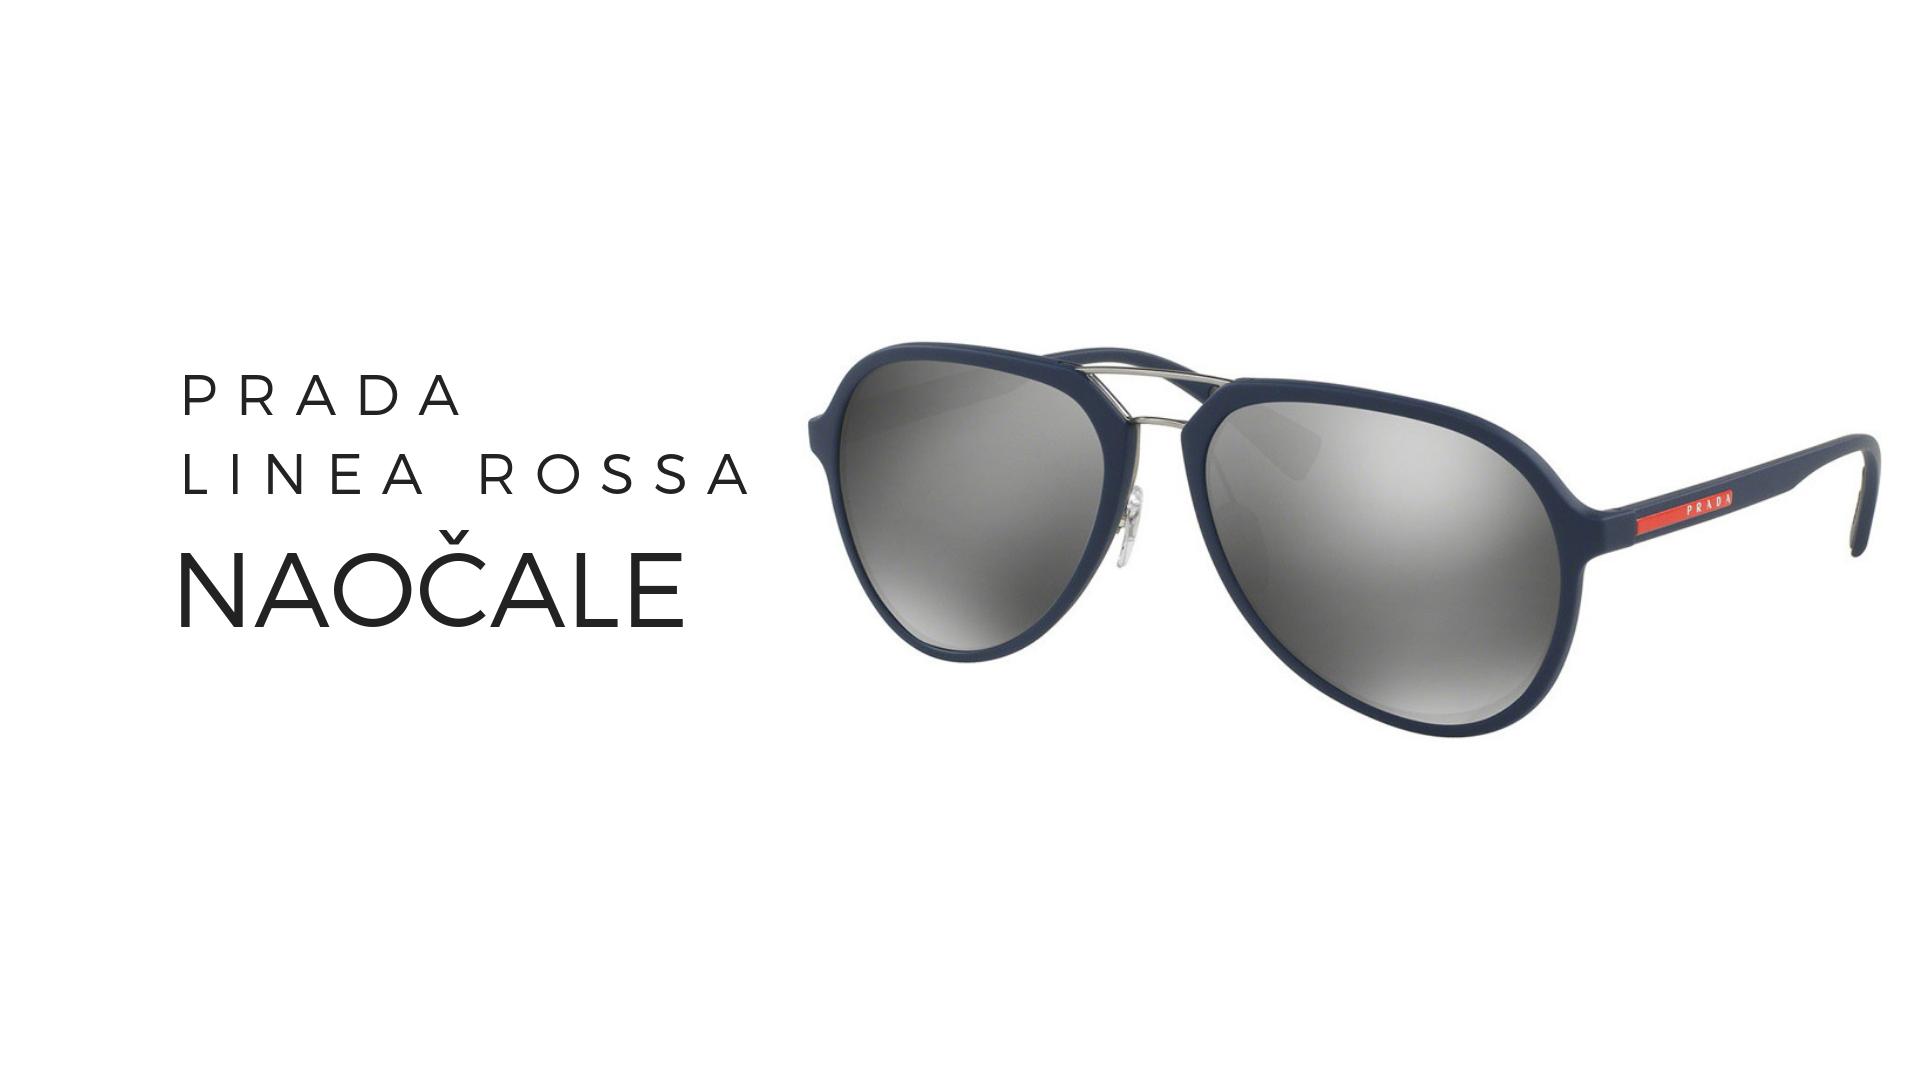 Prada Linea Rossa sunčane naočale. Prada sport sunčane naočale.